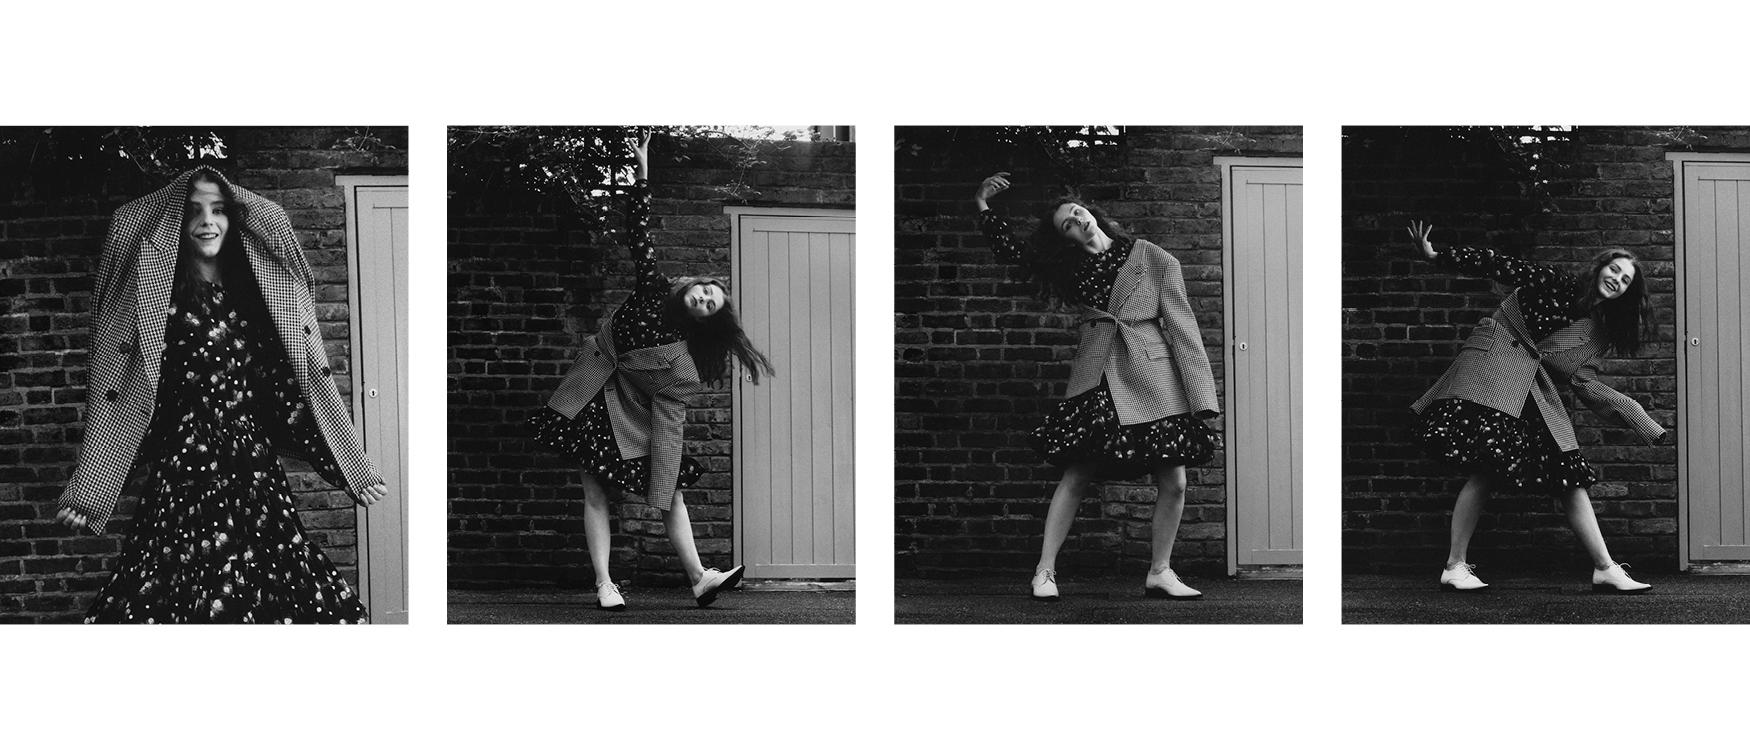 Jacket and shoes by AMI Paris. Dress by Miu Miu.